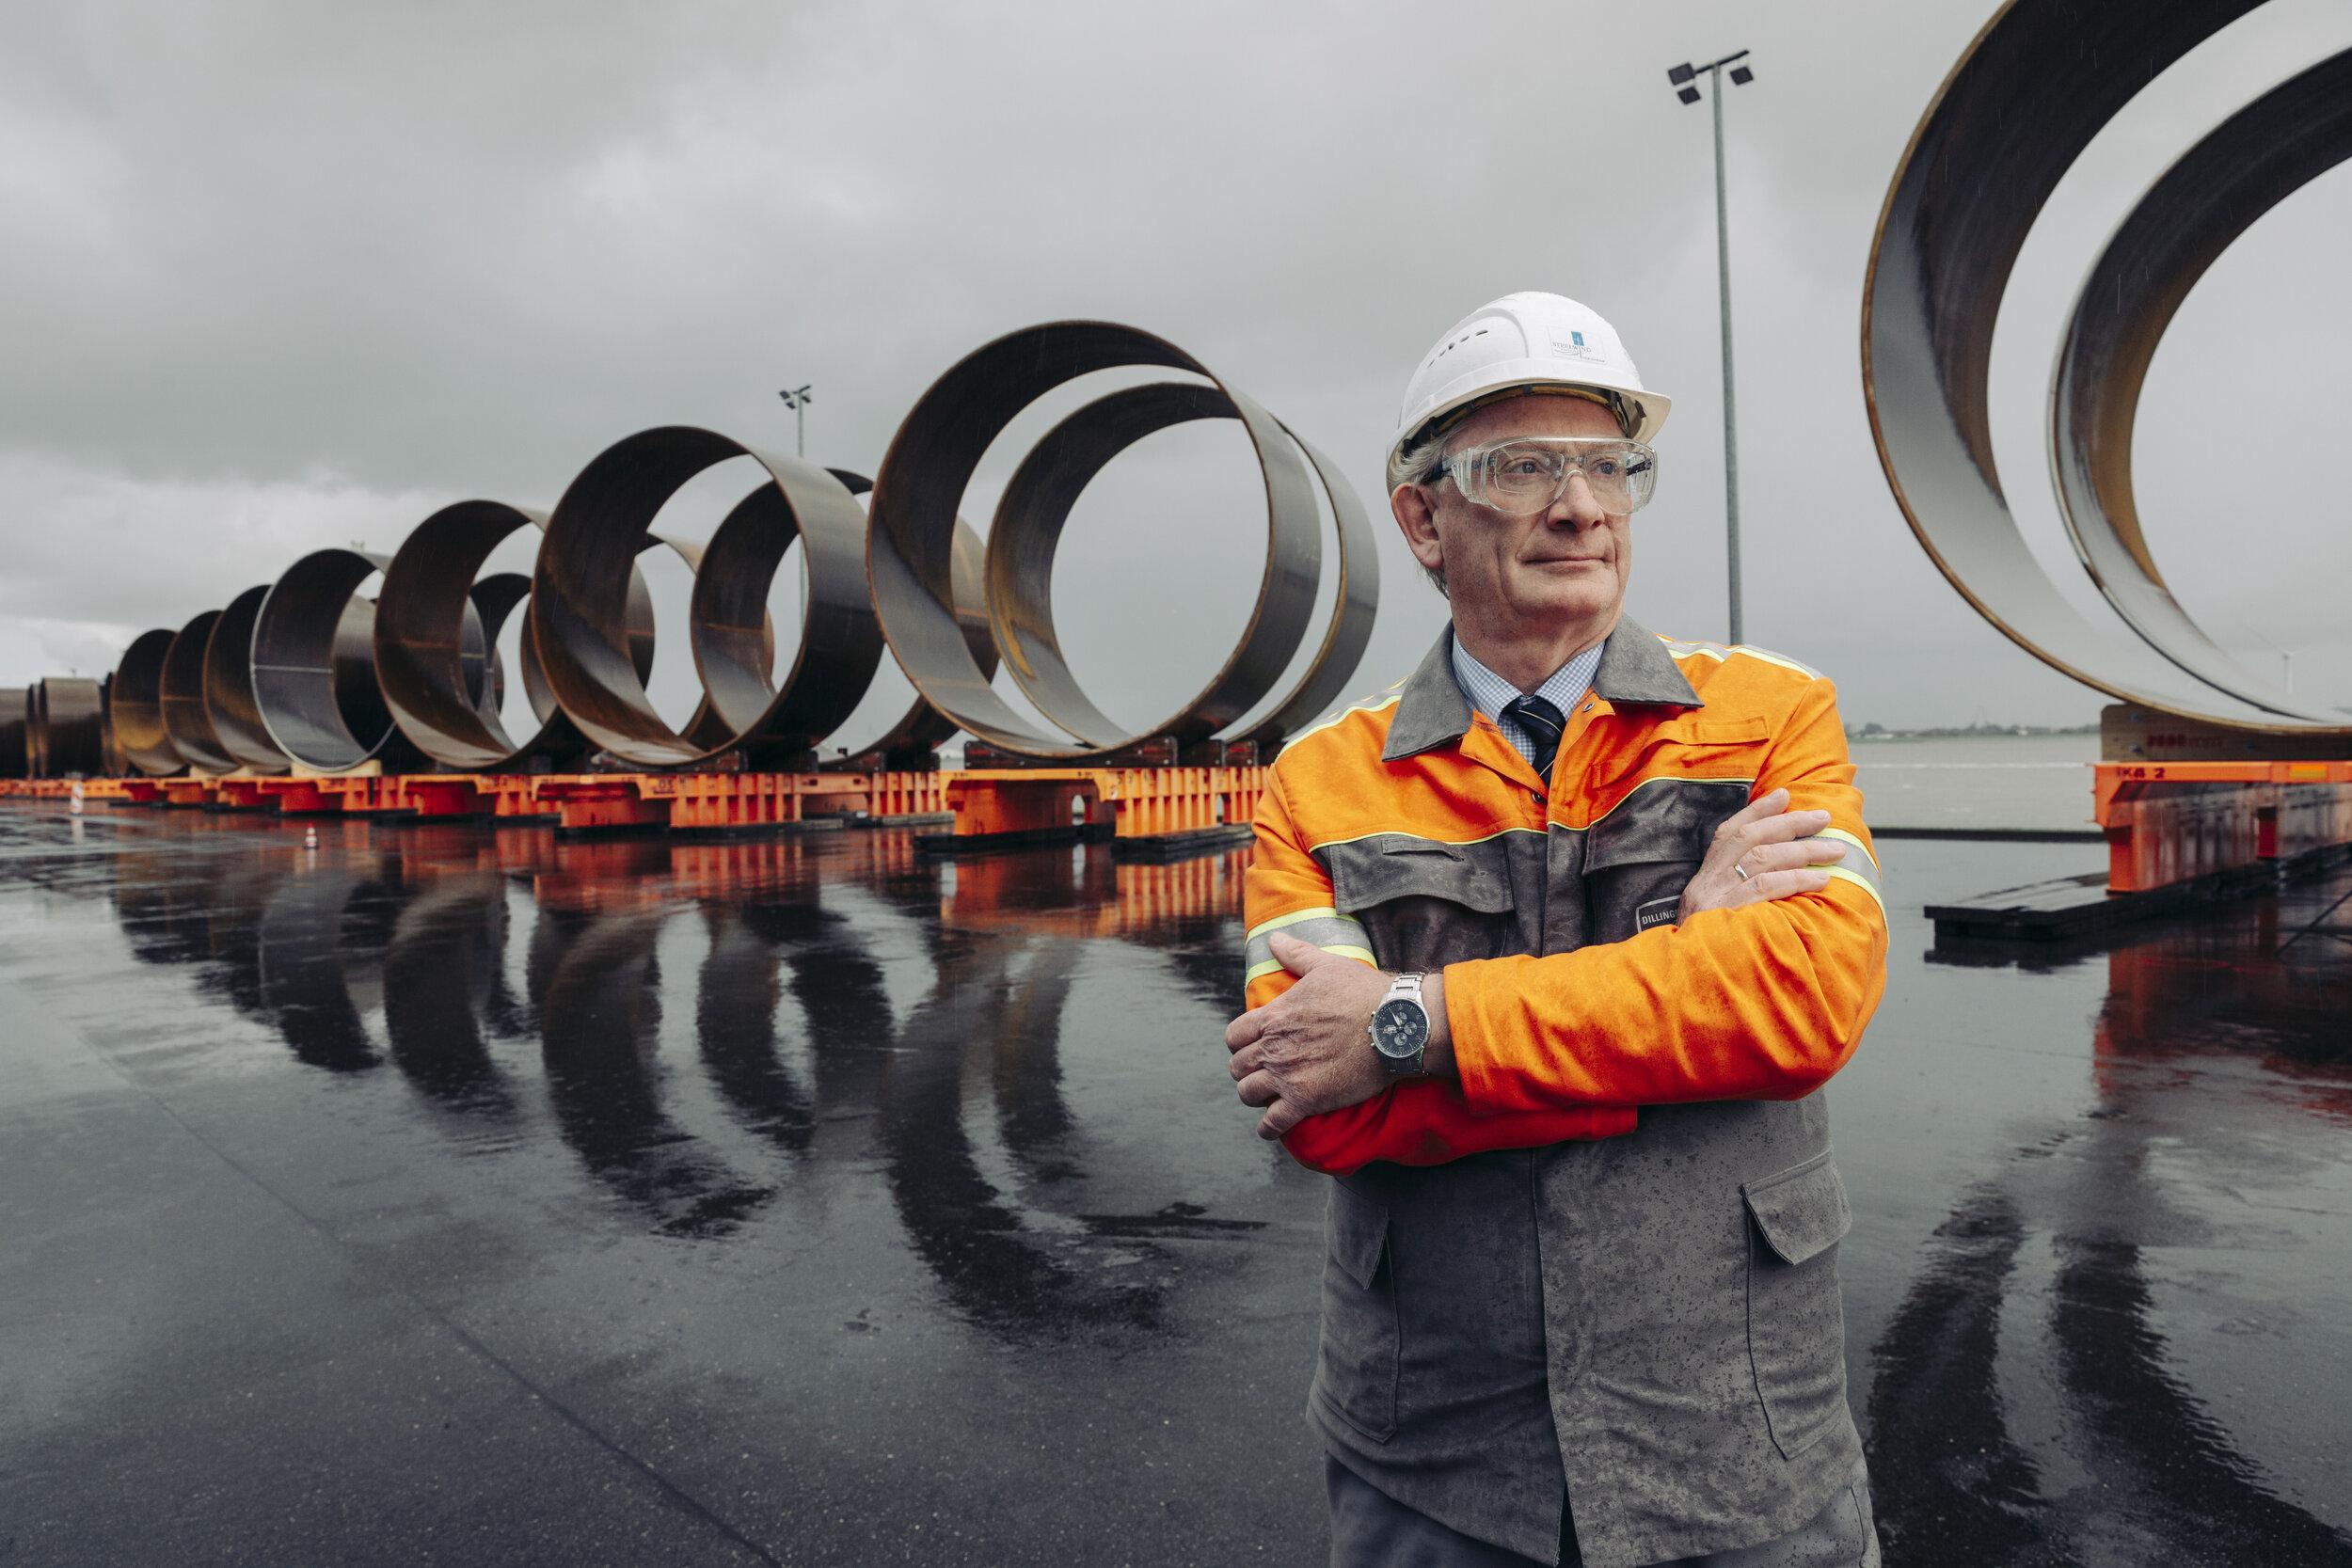 Ralf Hubo, CEO Steelwind Nordenham